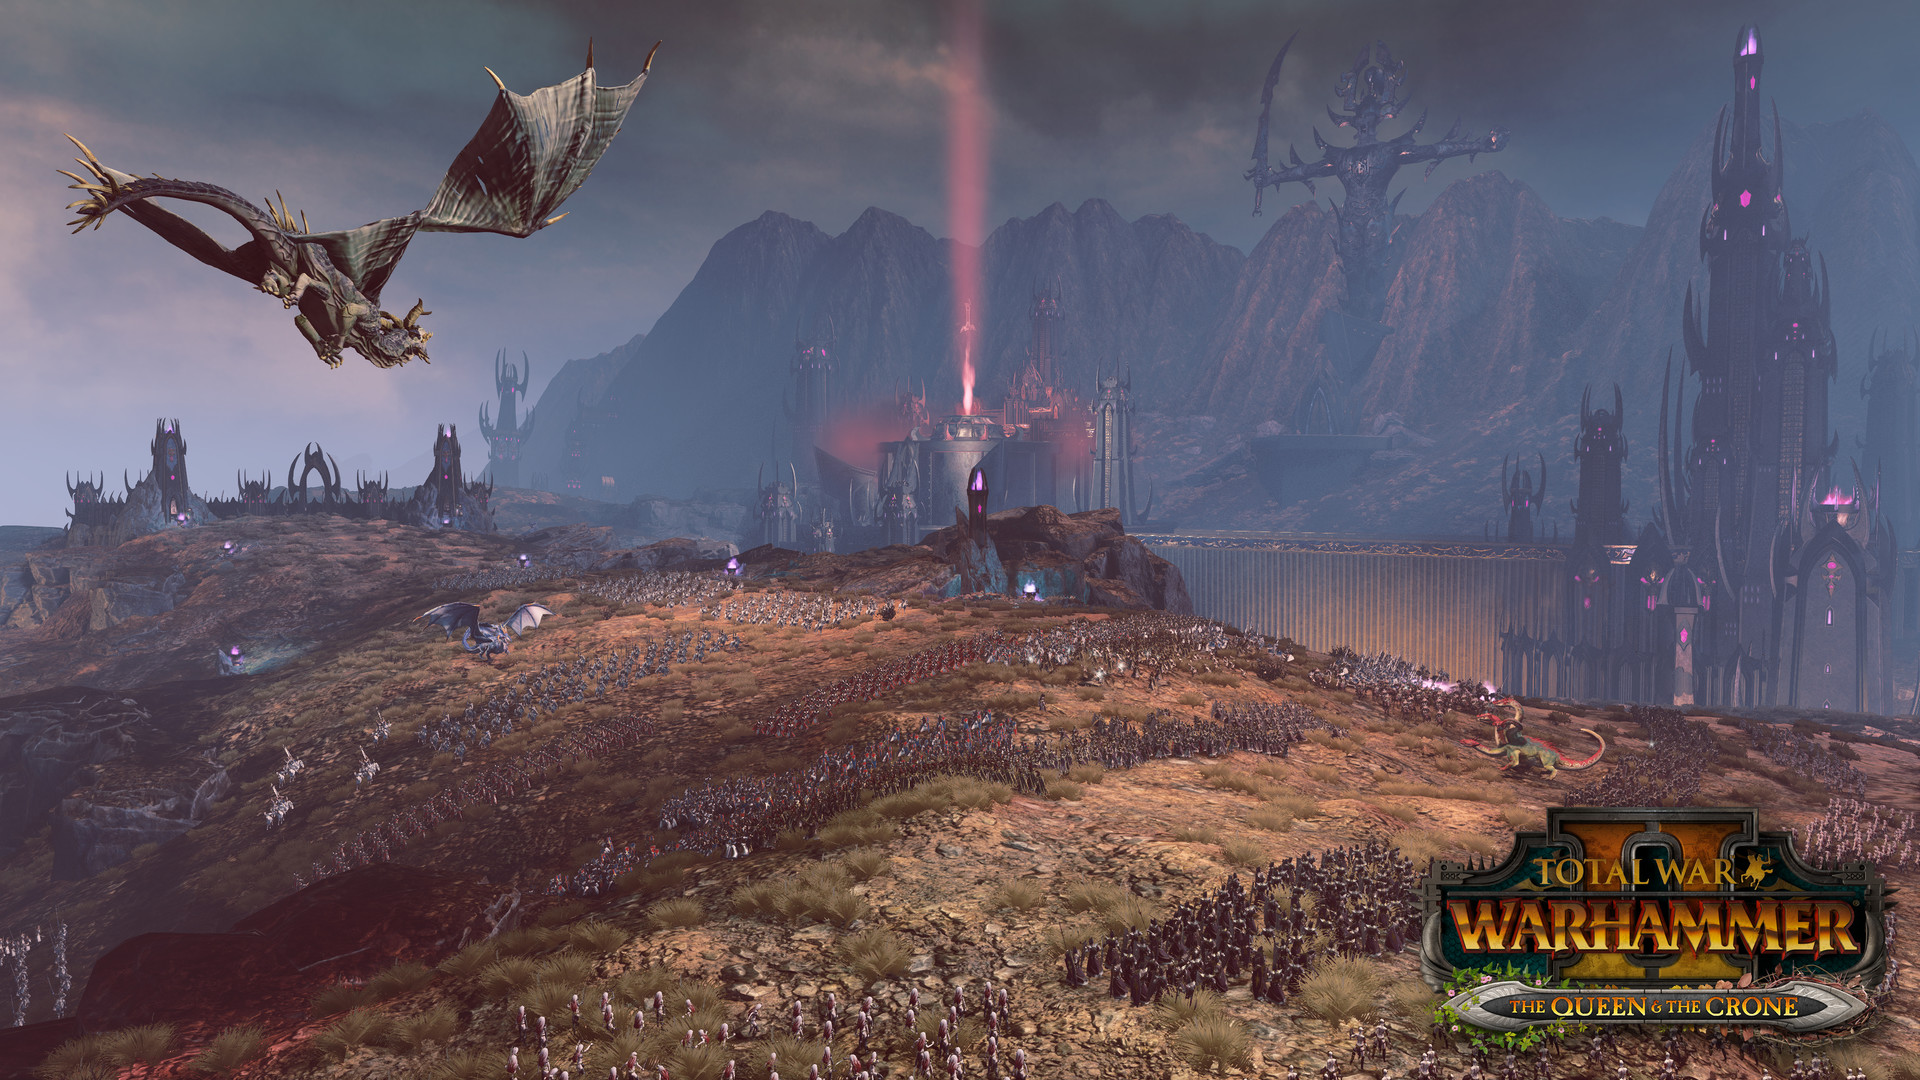 Total War: WARHAMMER II (RUS|ENG|Multi13) [SteamRip] vano_next